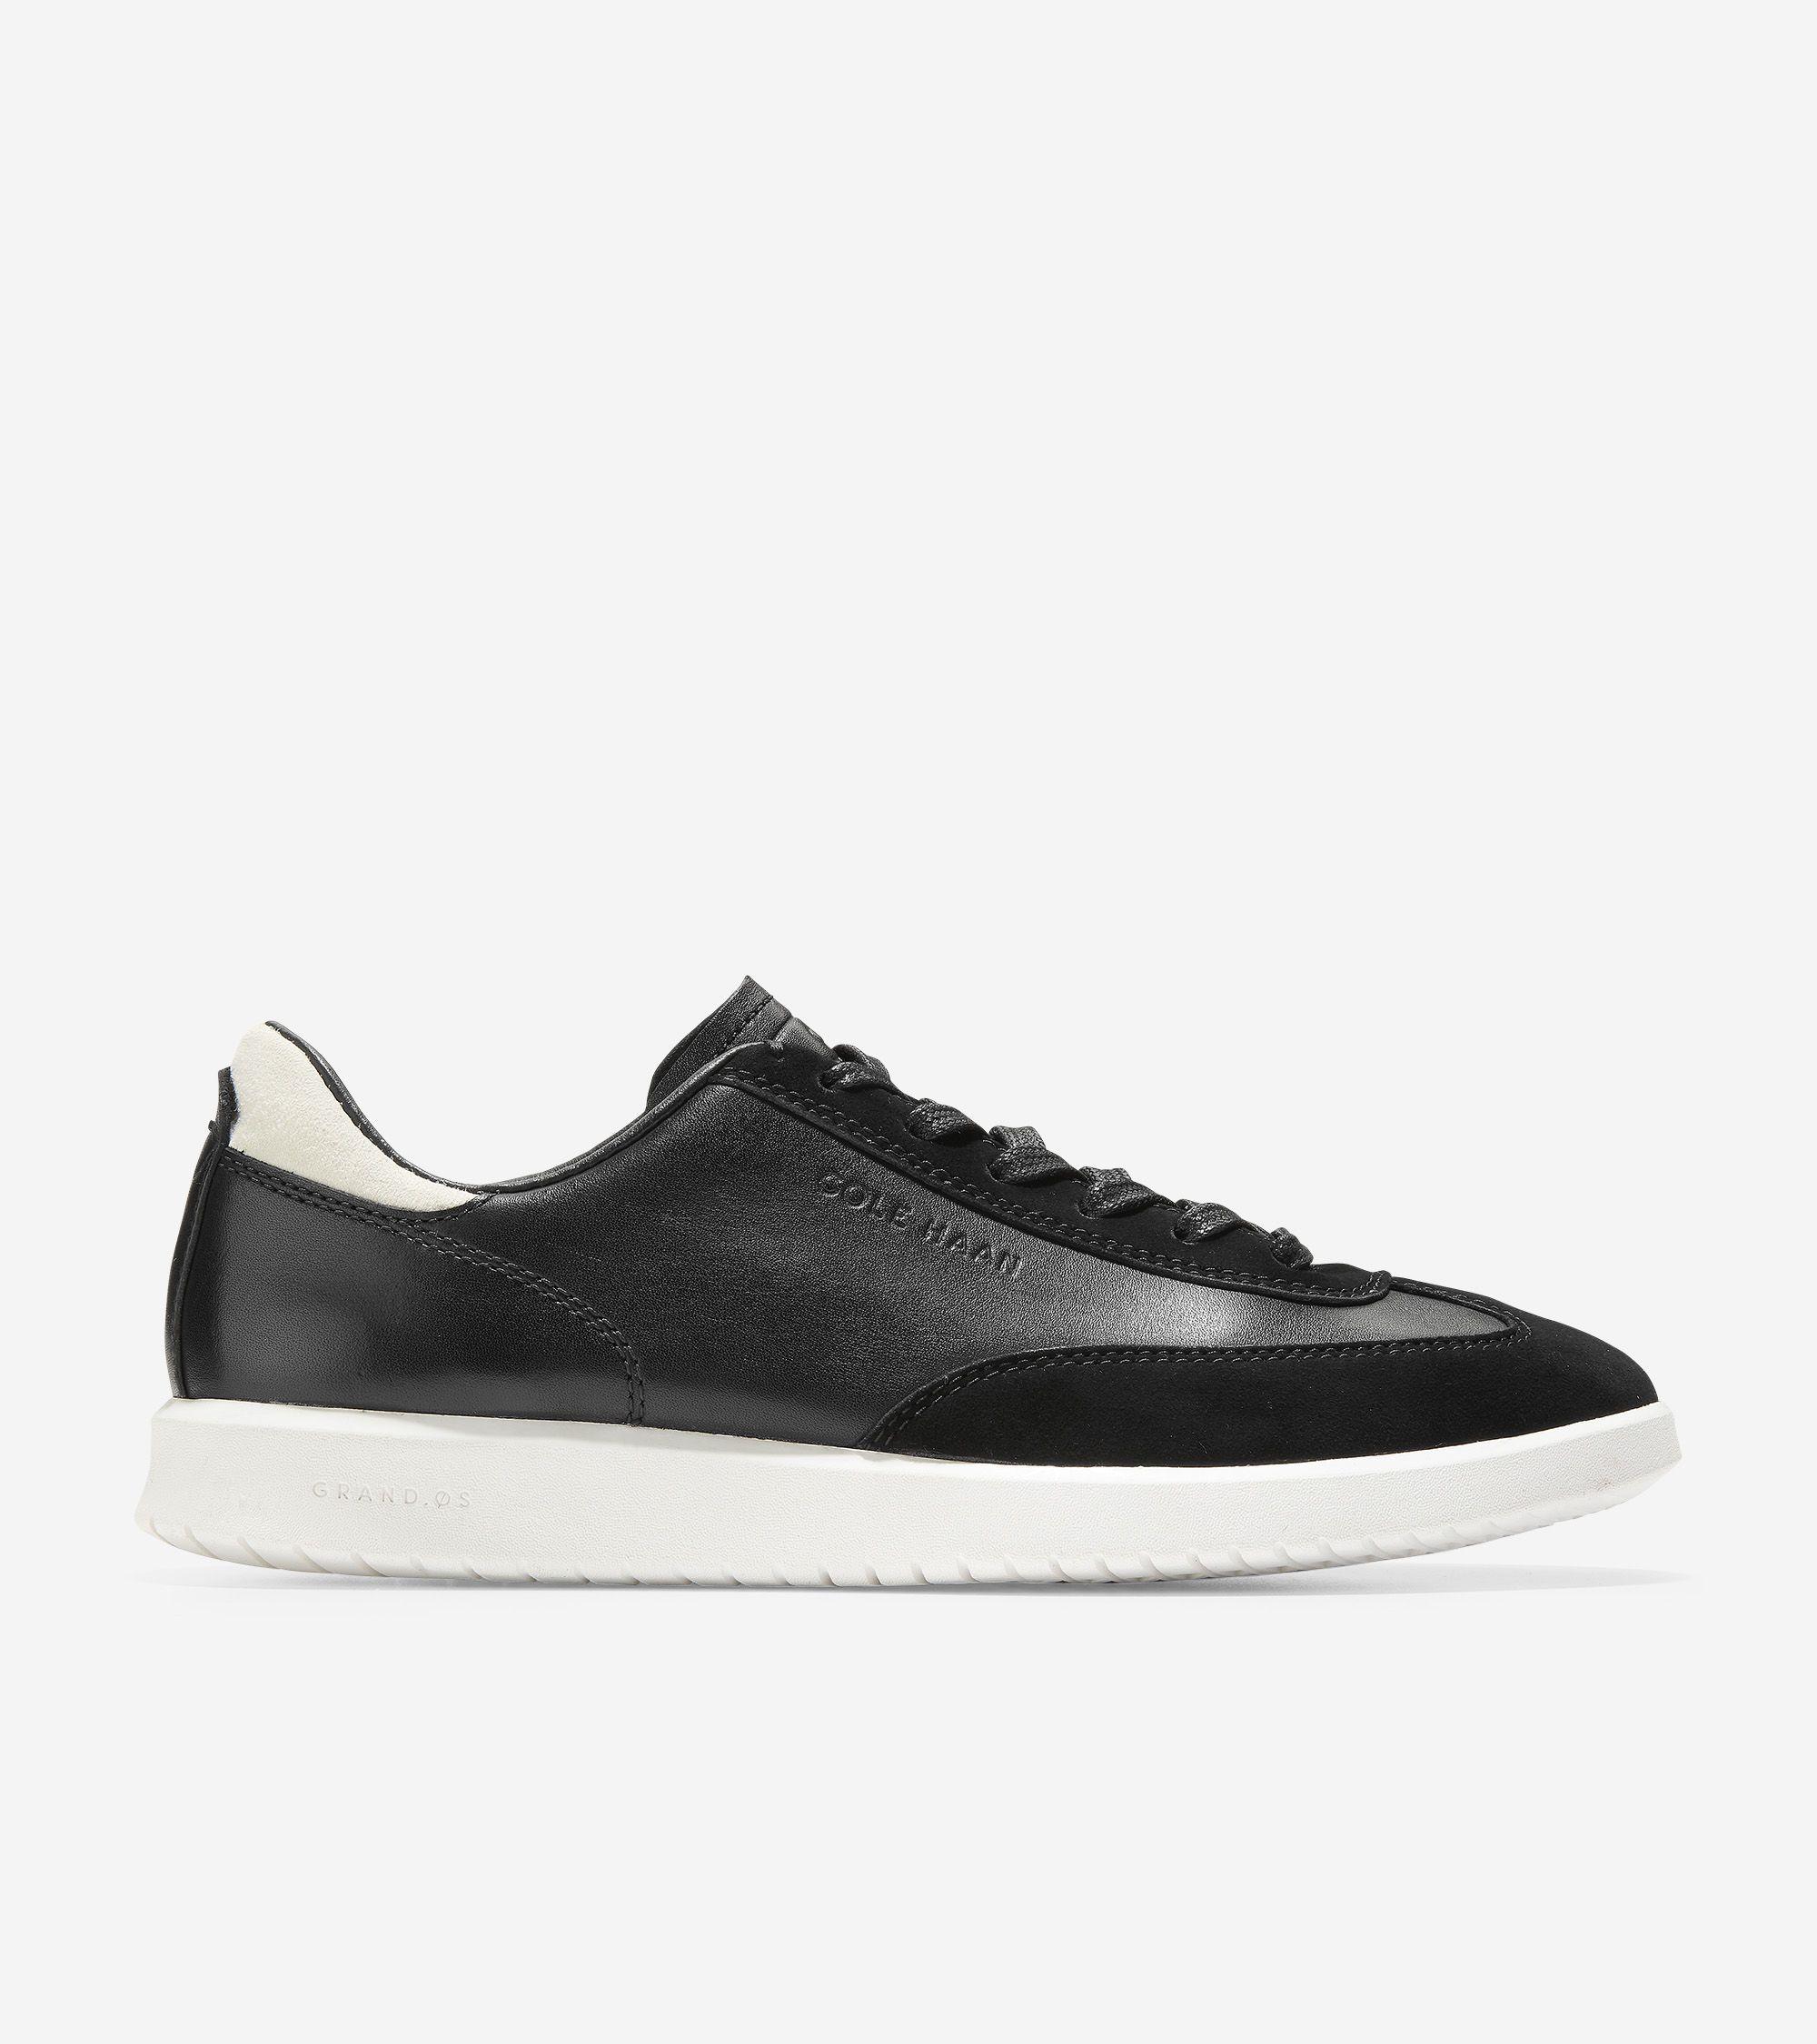 Cole Haan Women's GrandPrø Turf LS Sneaker (Black Leather